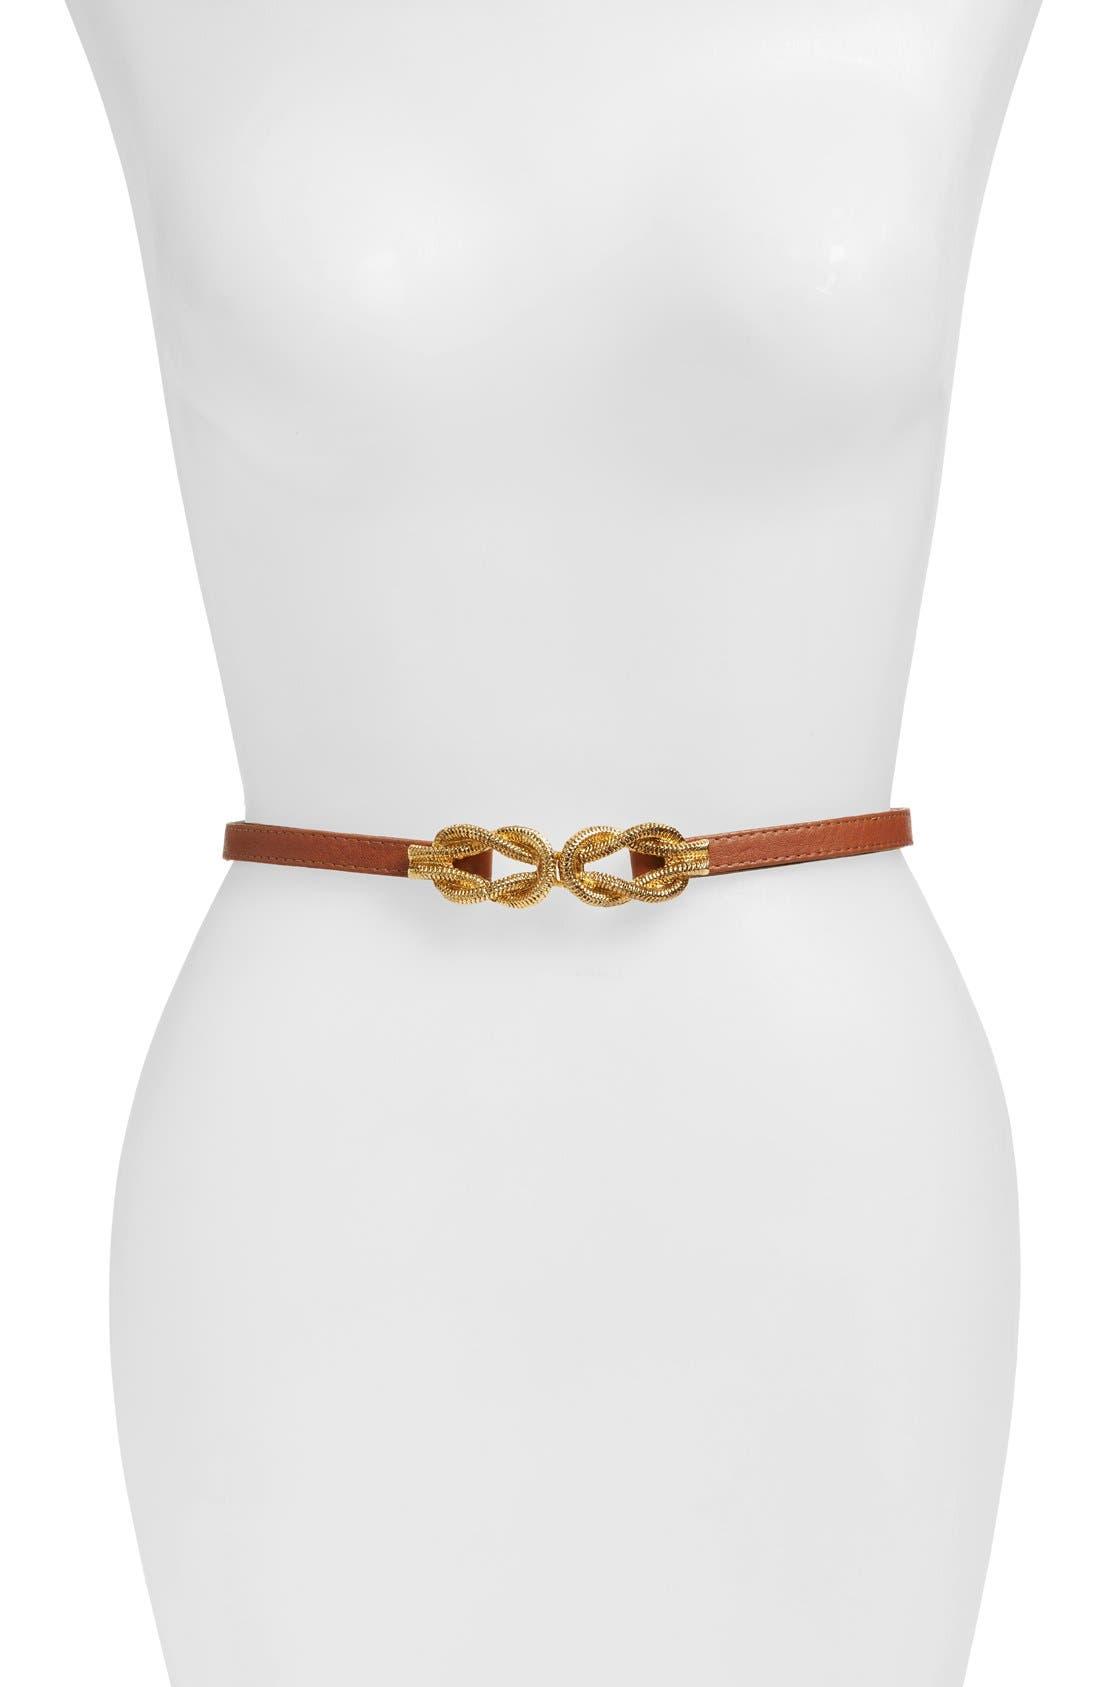 'Lillian' Belt,                         Main,                         color, COGNAC